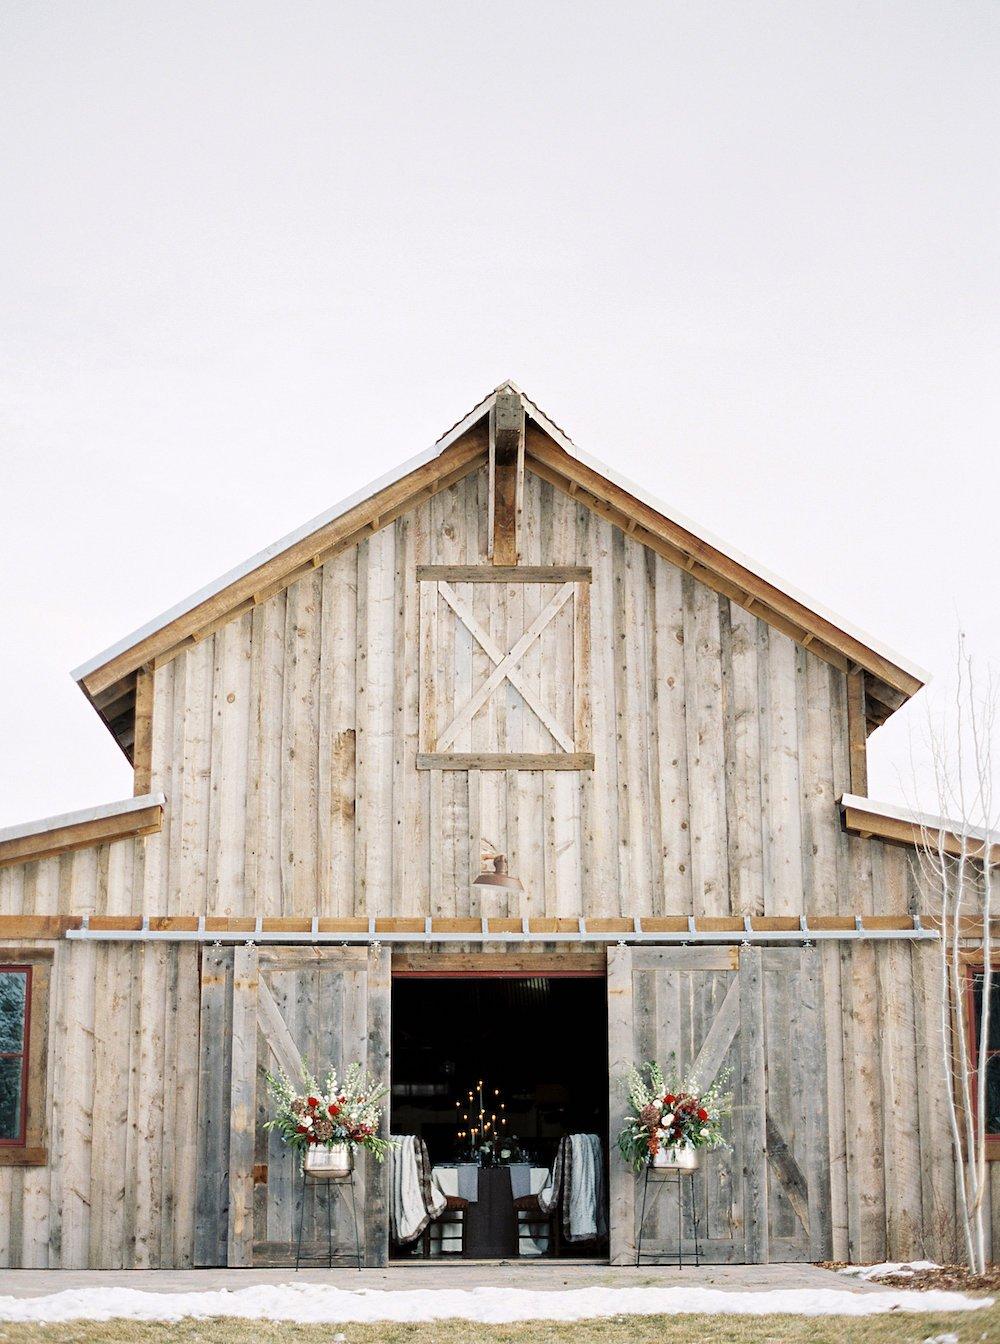 Peeking through the doors of the Buckle Barn at a wedding reception